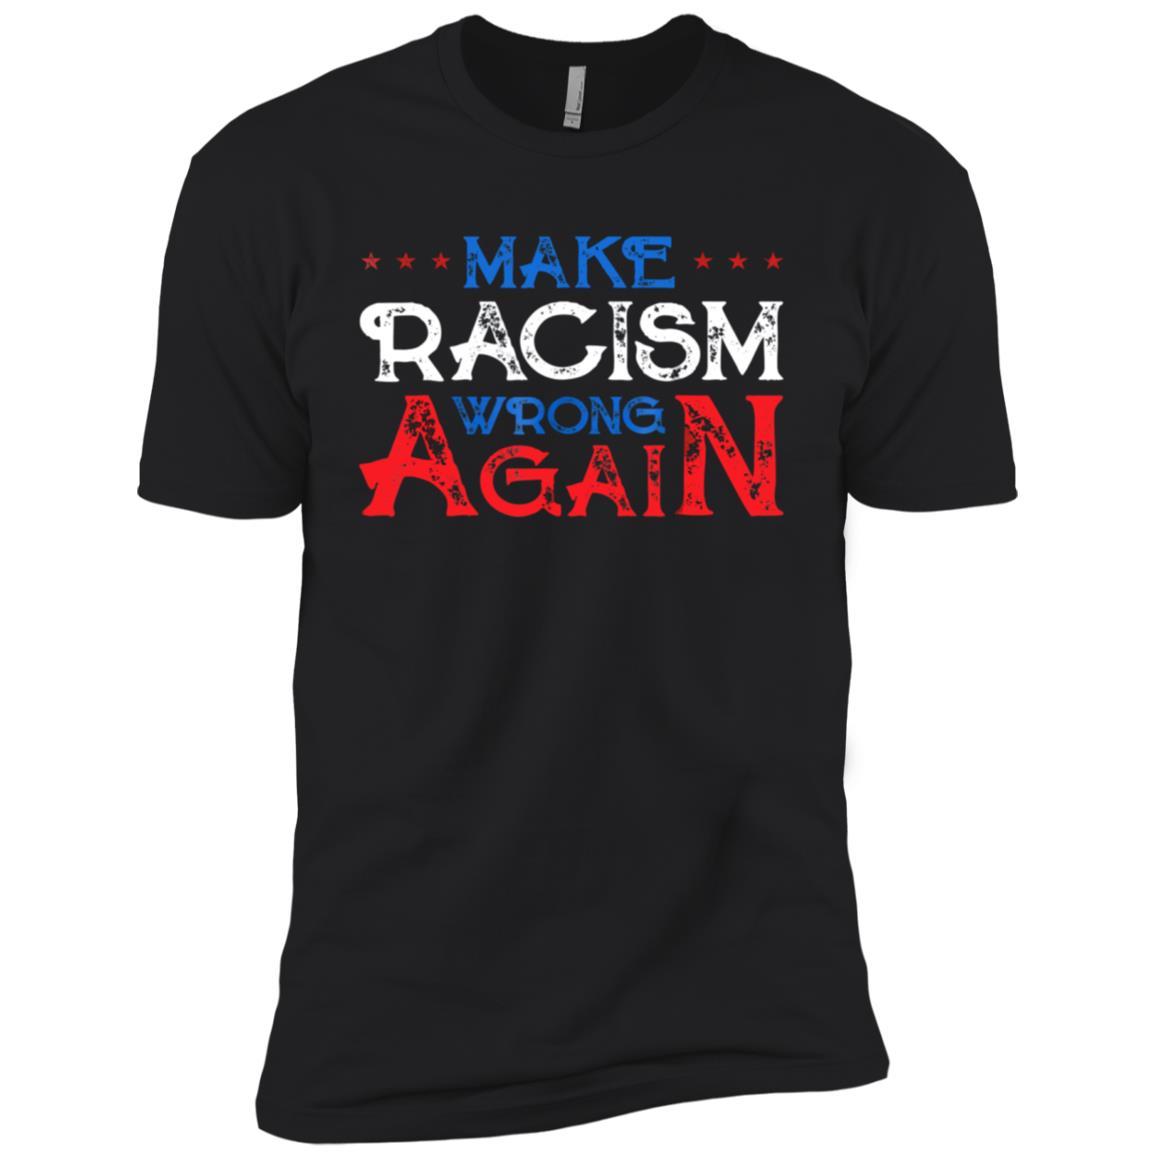 Make Racism Wrong Again – Unite Against Racism -16 Men Short Sleeve T-Shirt